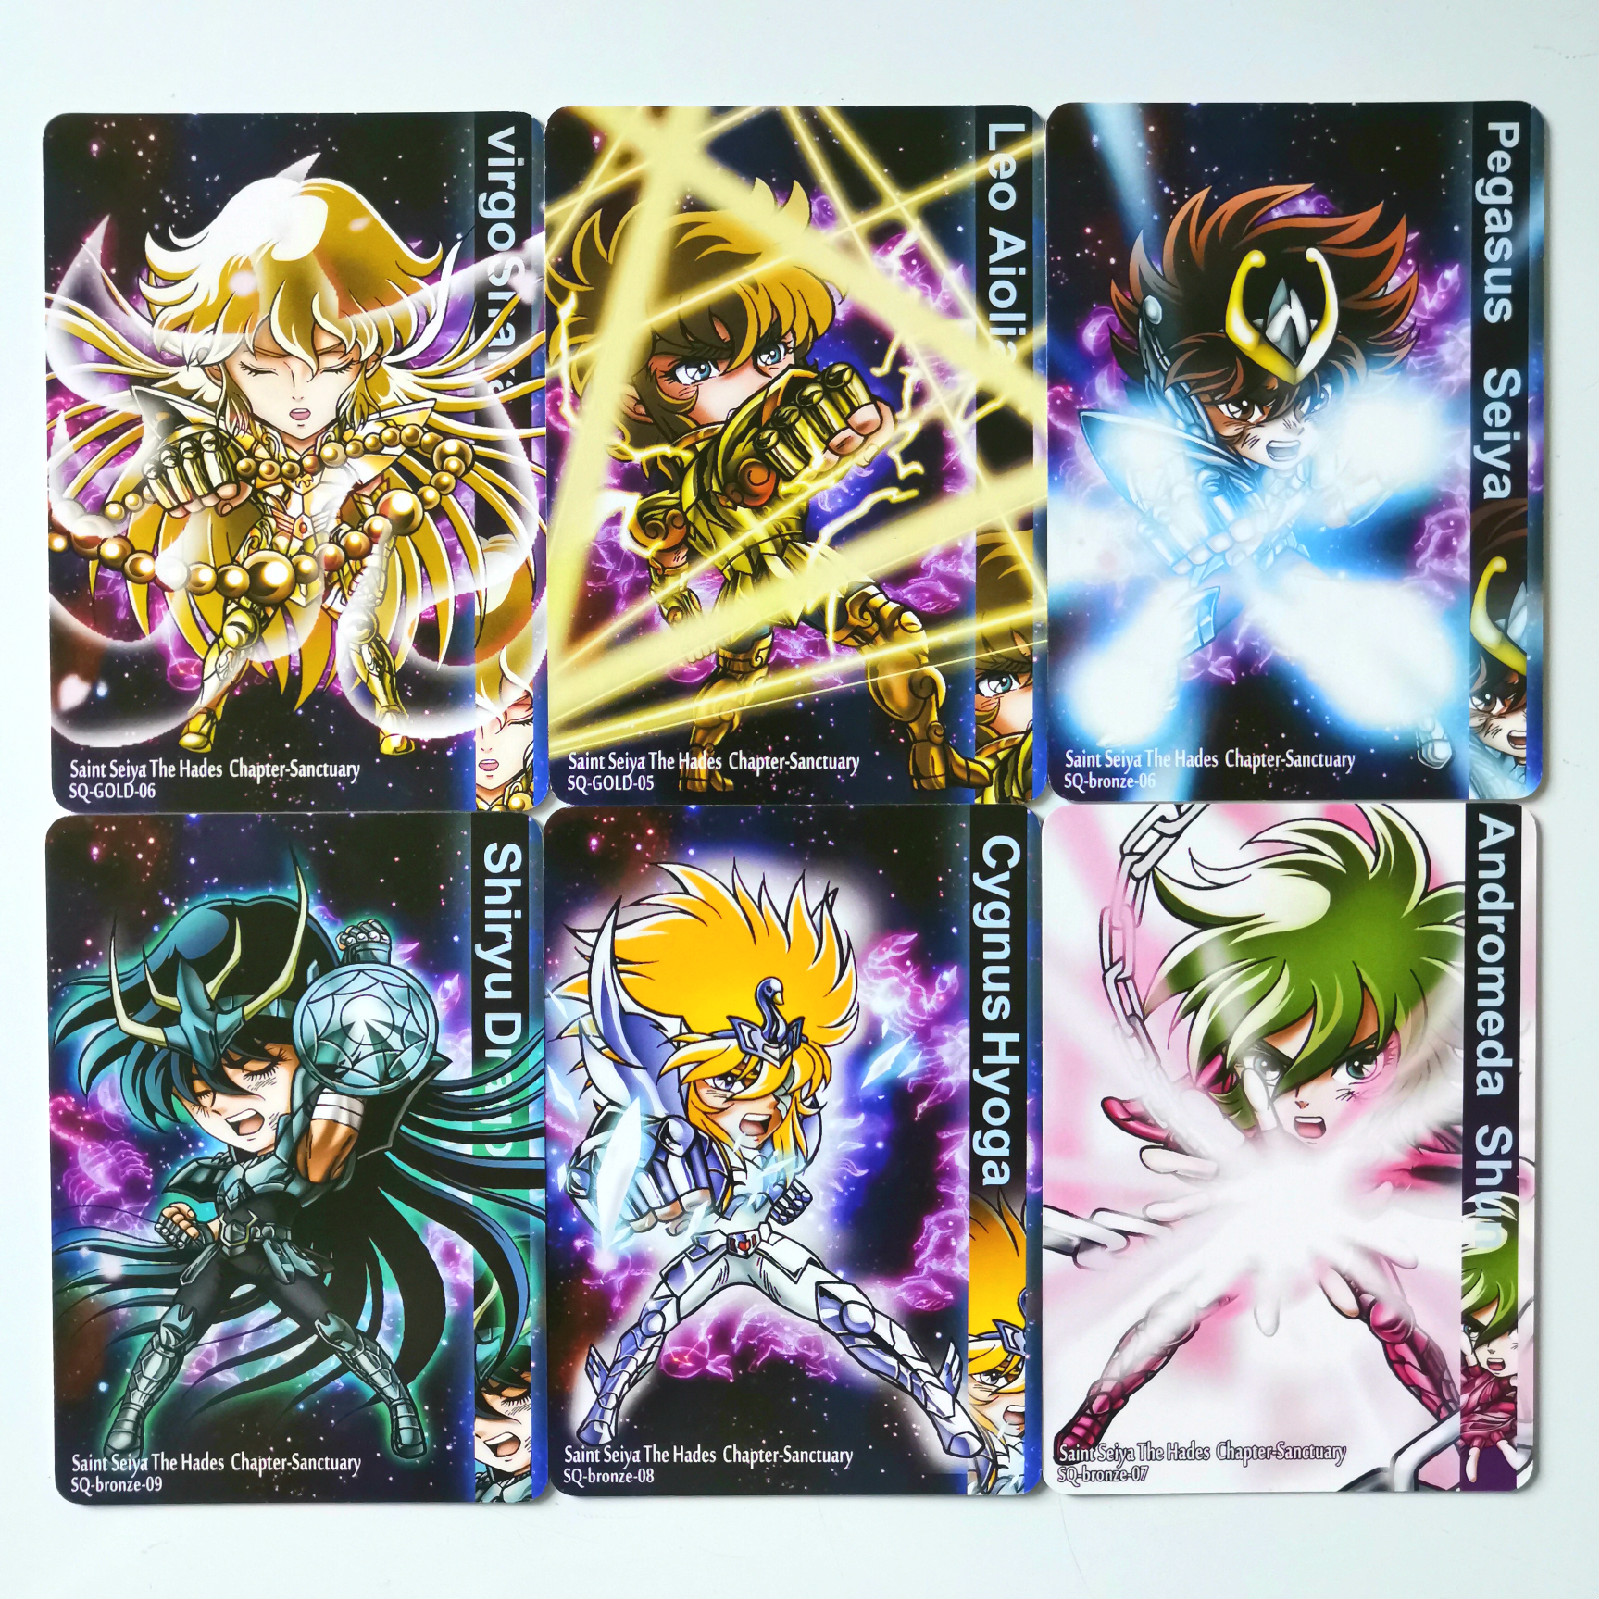 46pcs/set Saint Seiya Toys Hobbies Hobby Collectibles Game Collection Anime Cards